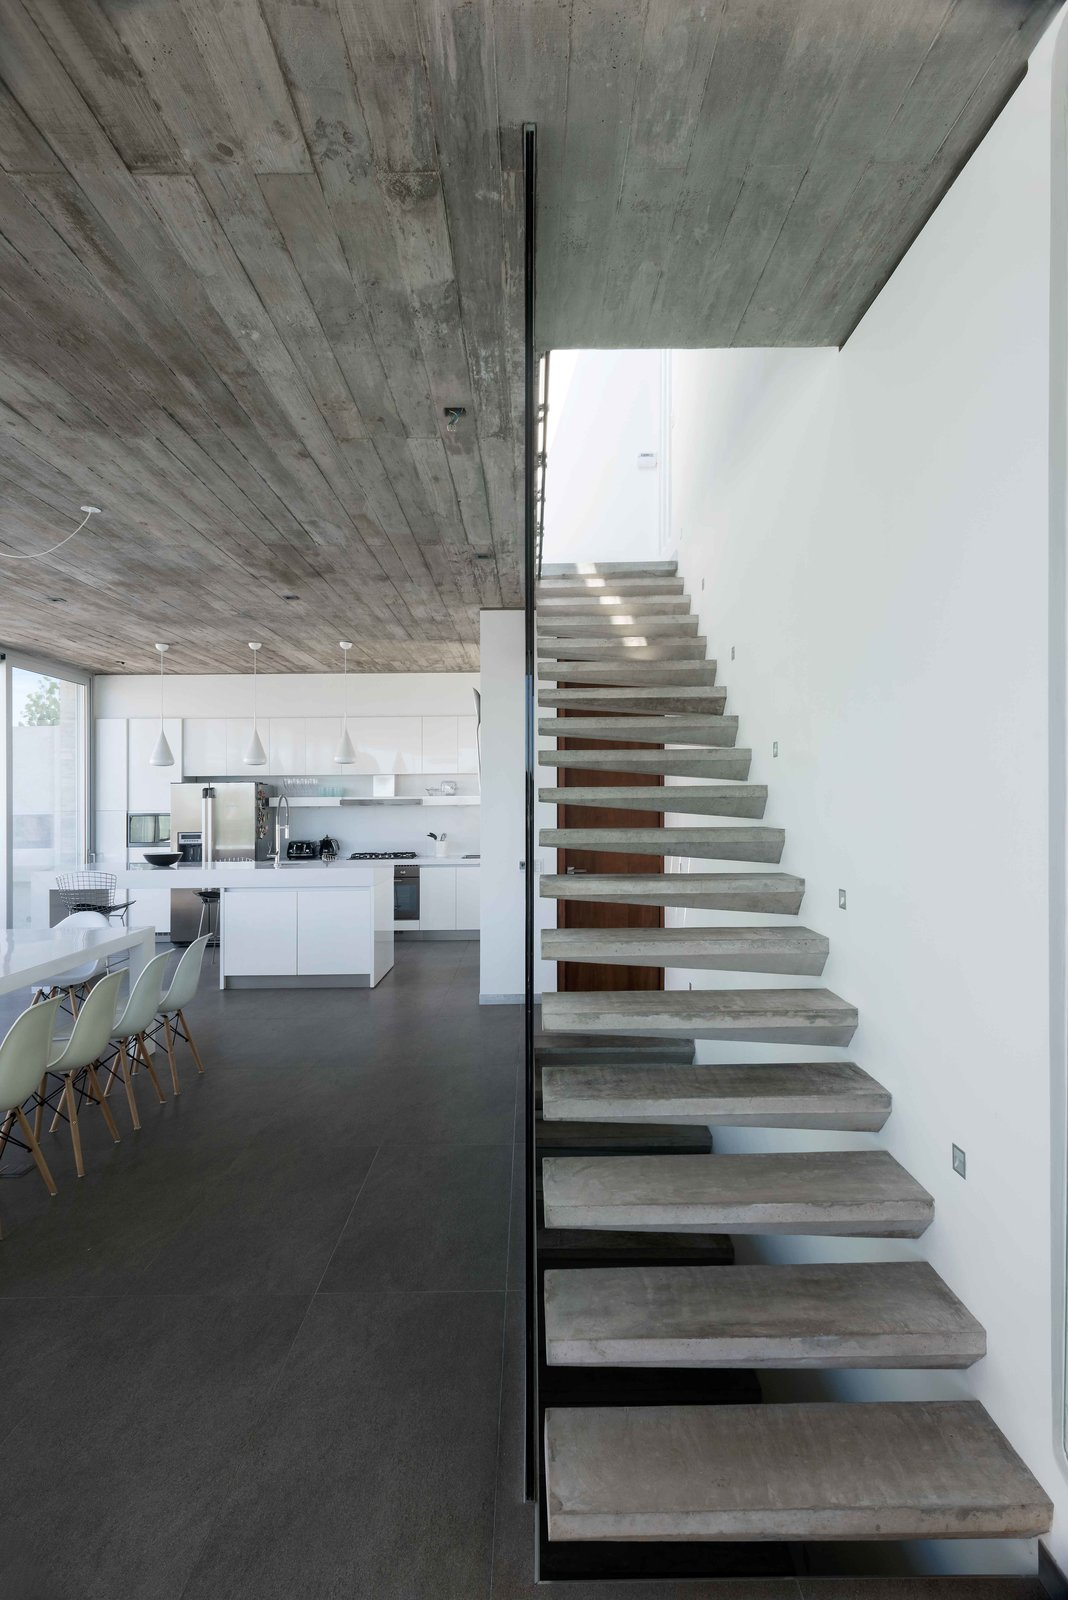 Staircase, Concrete Tread, and Glass Railing Stairs  La Iluminada by MARTIN GOMEZ ARQUITECTOS